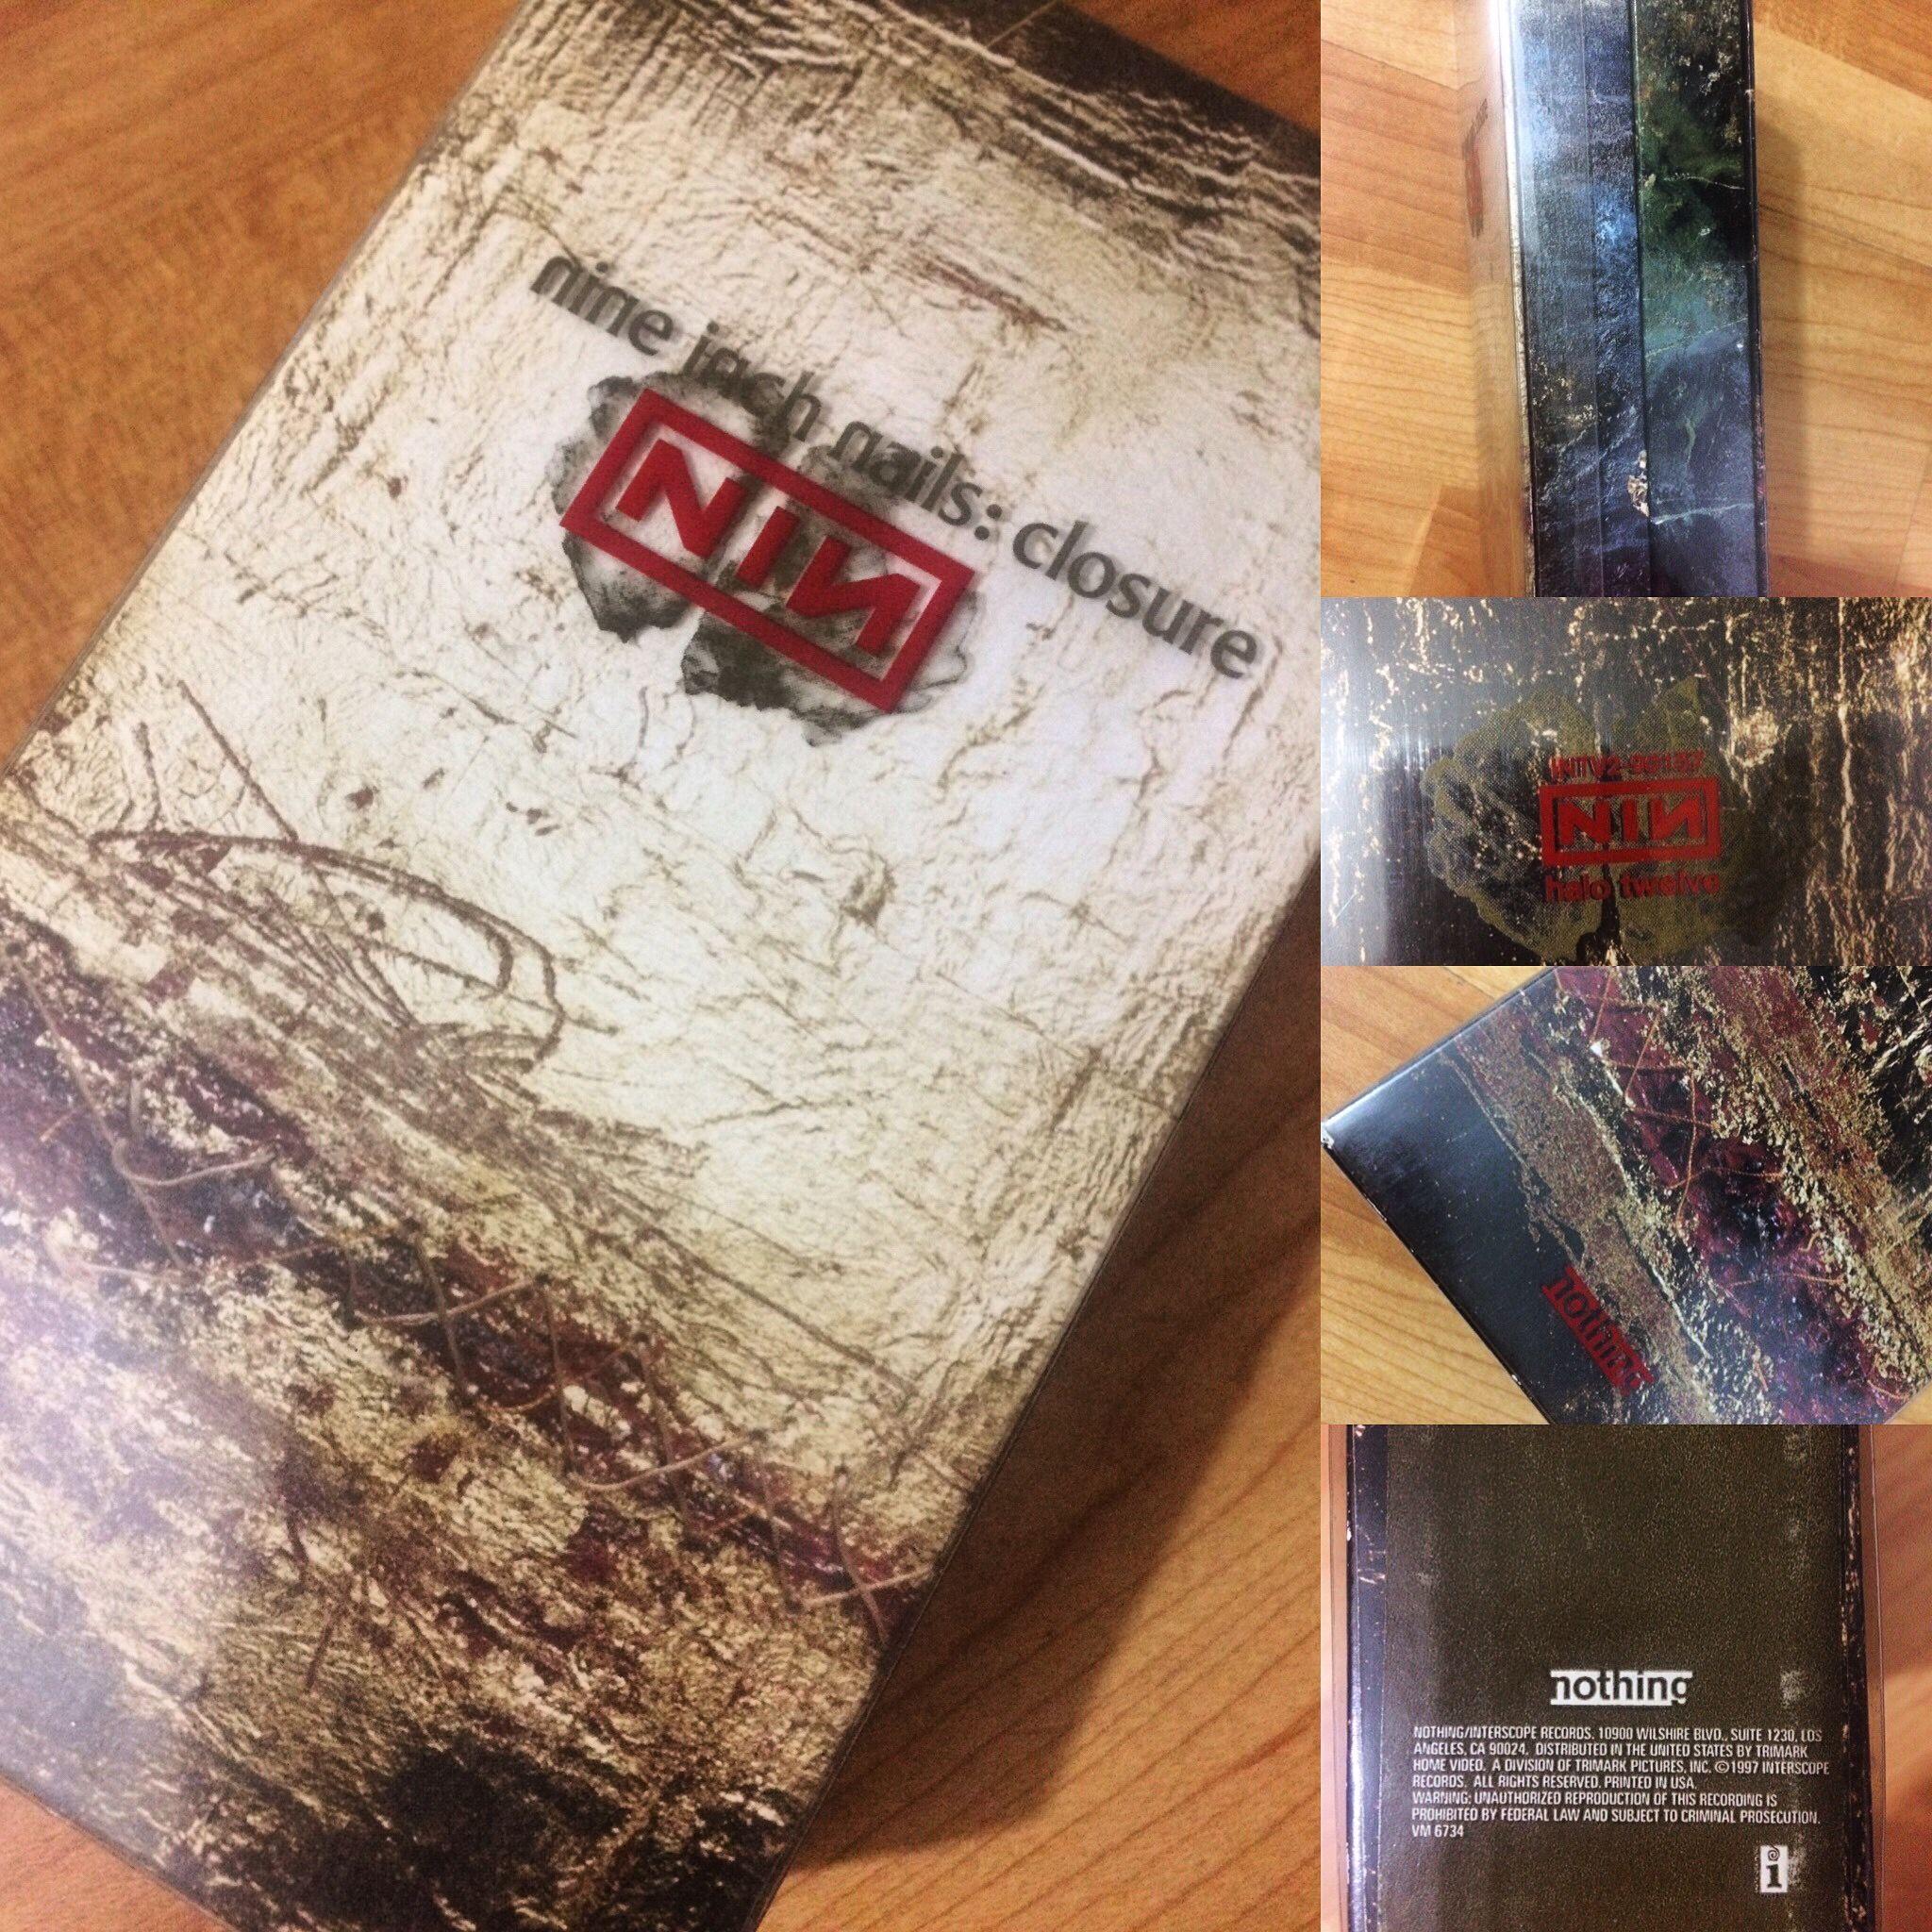 Nine Inch Nails: Closure Box Set | Music Memorabilia | Pinterest ...